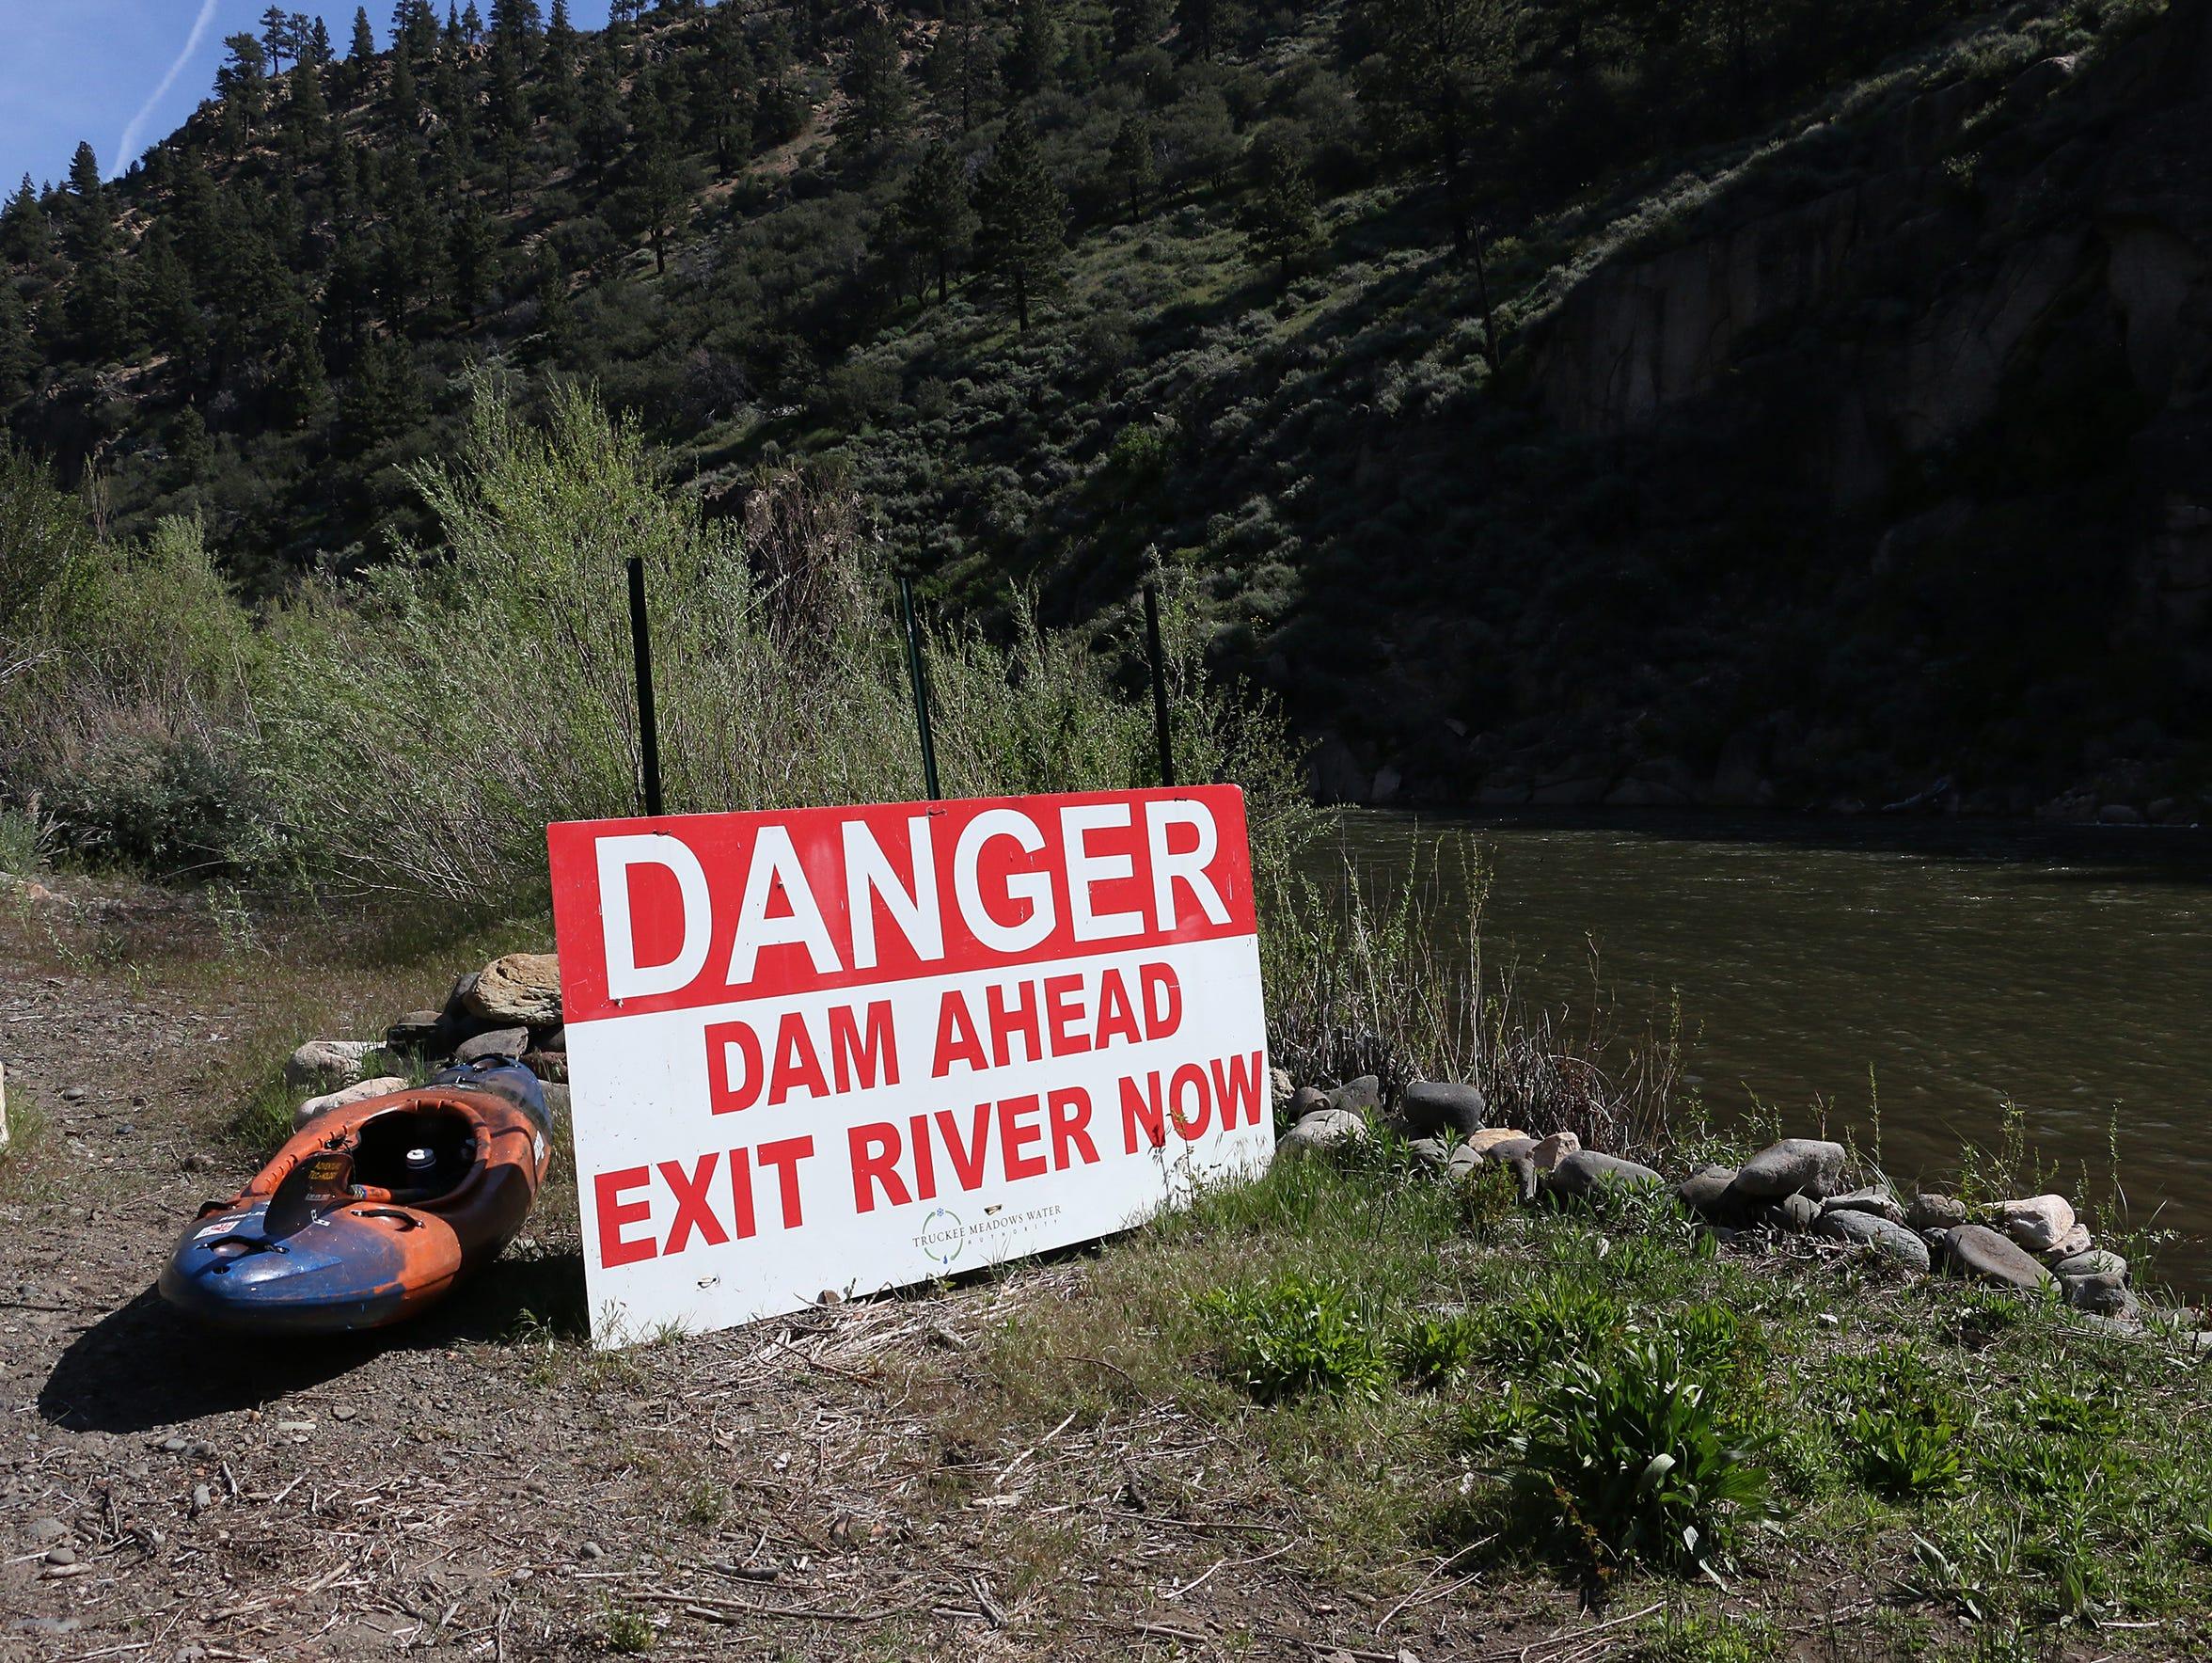 RGJ reporters Ben Spillman and Jason Bean paddle the